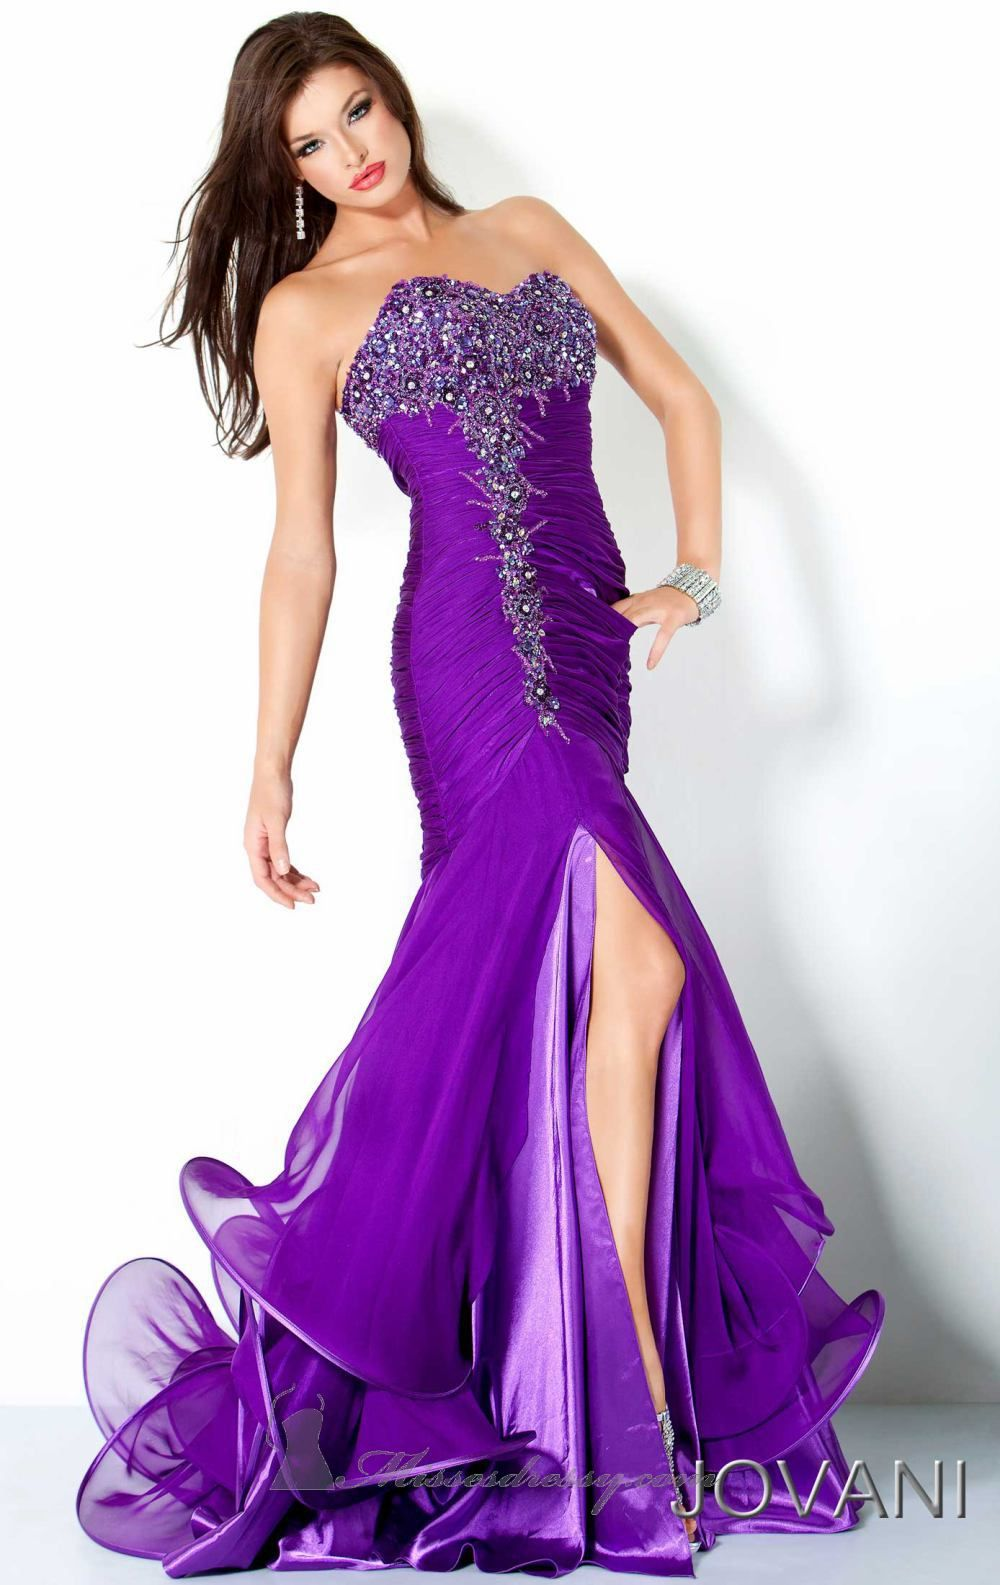 Jovani 3100 Dress - Available at www.missesdressy.com | Evening ...